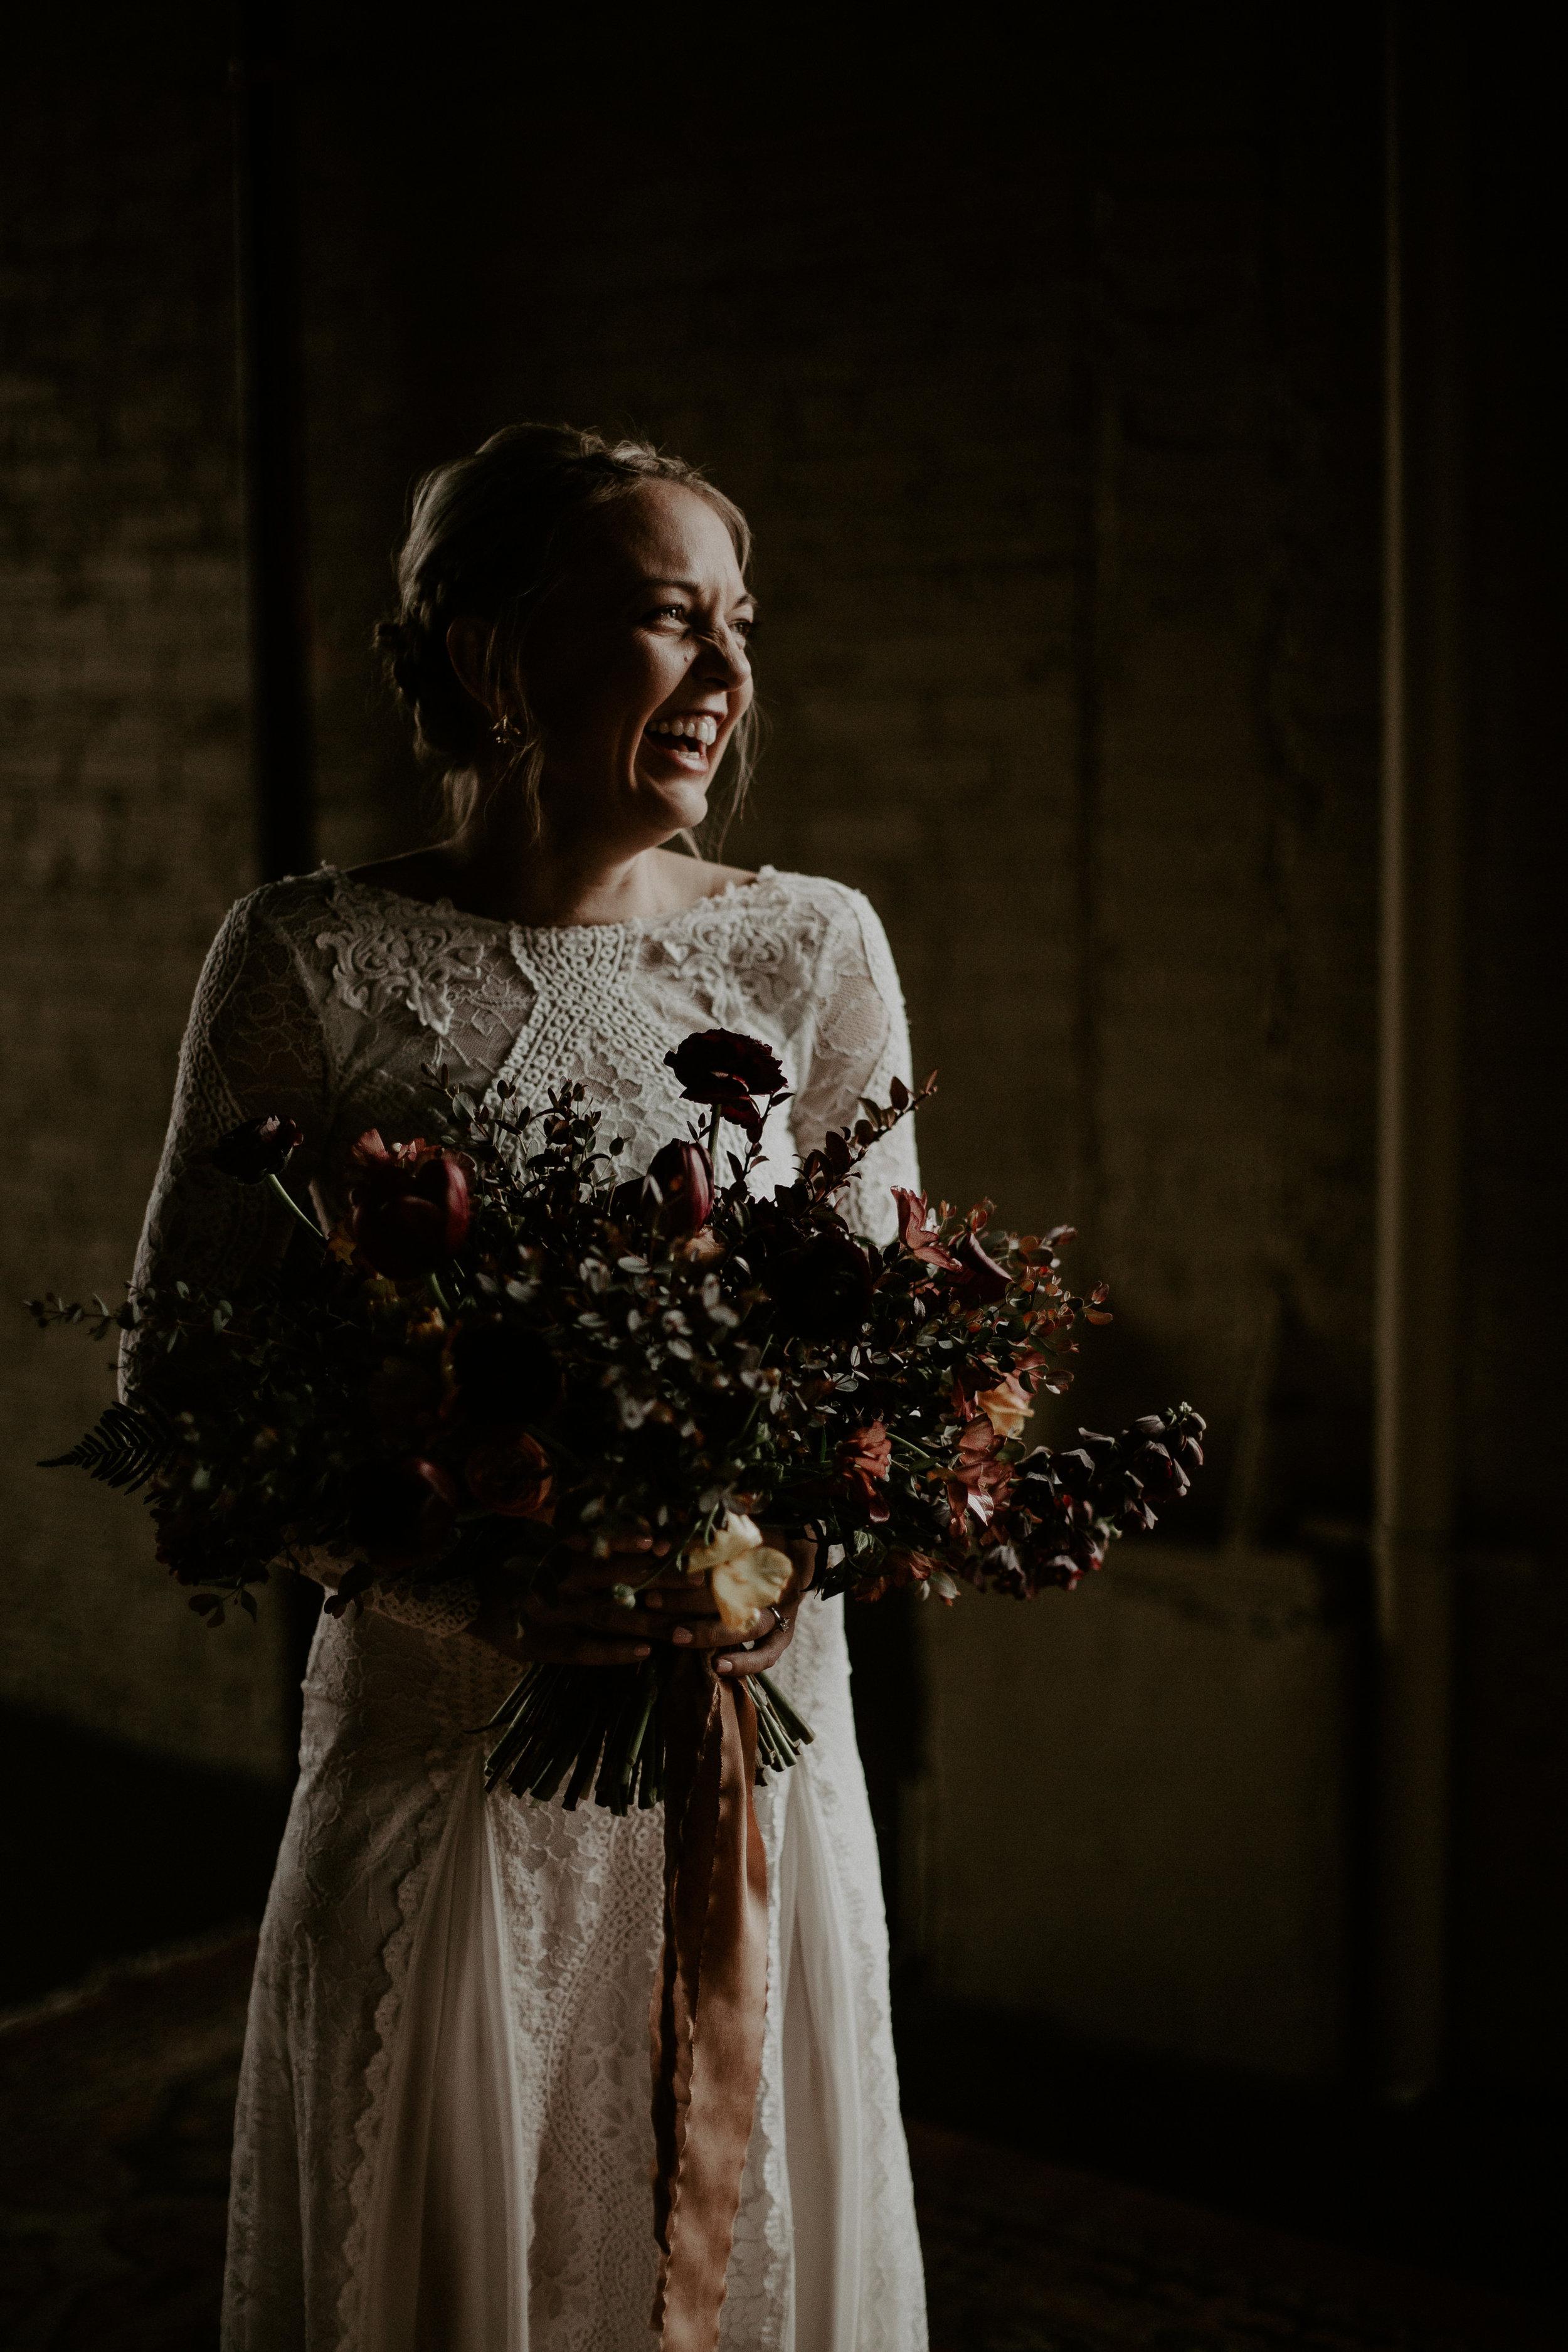 The_Steam_Plant_Dayton_Wedding-EDIT-137.jpg